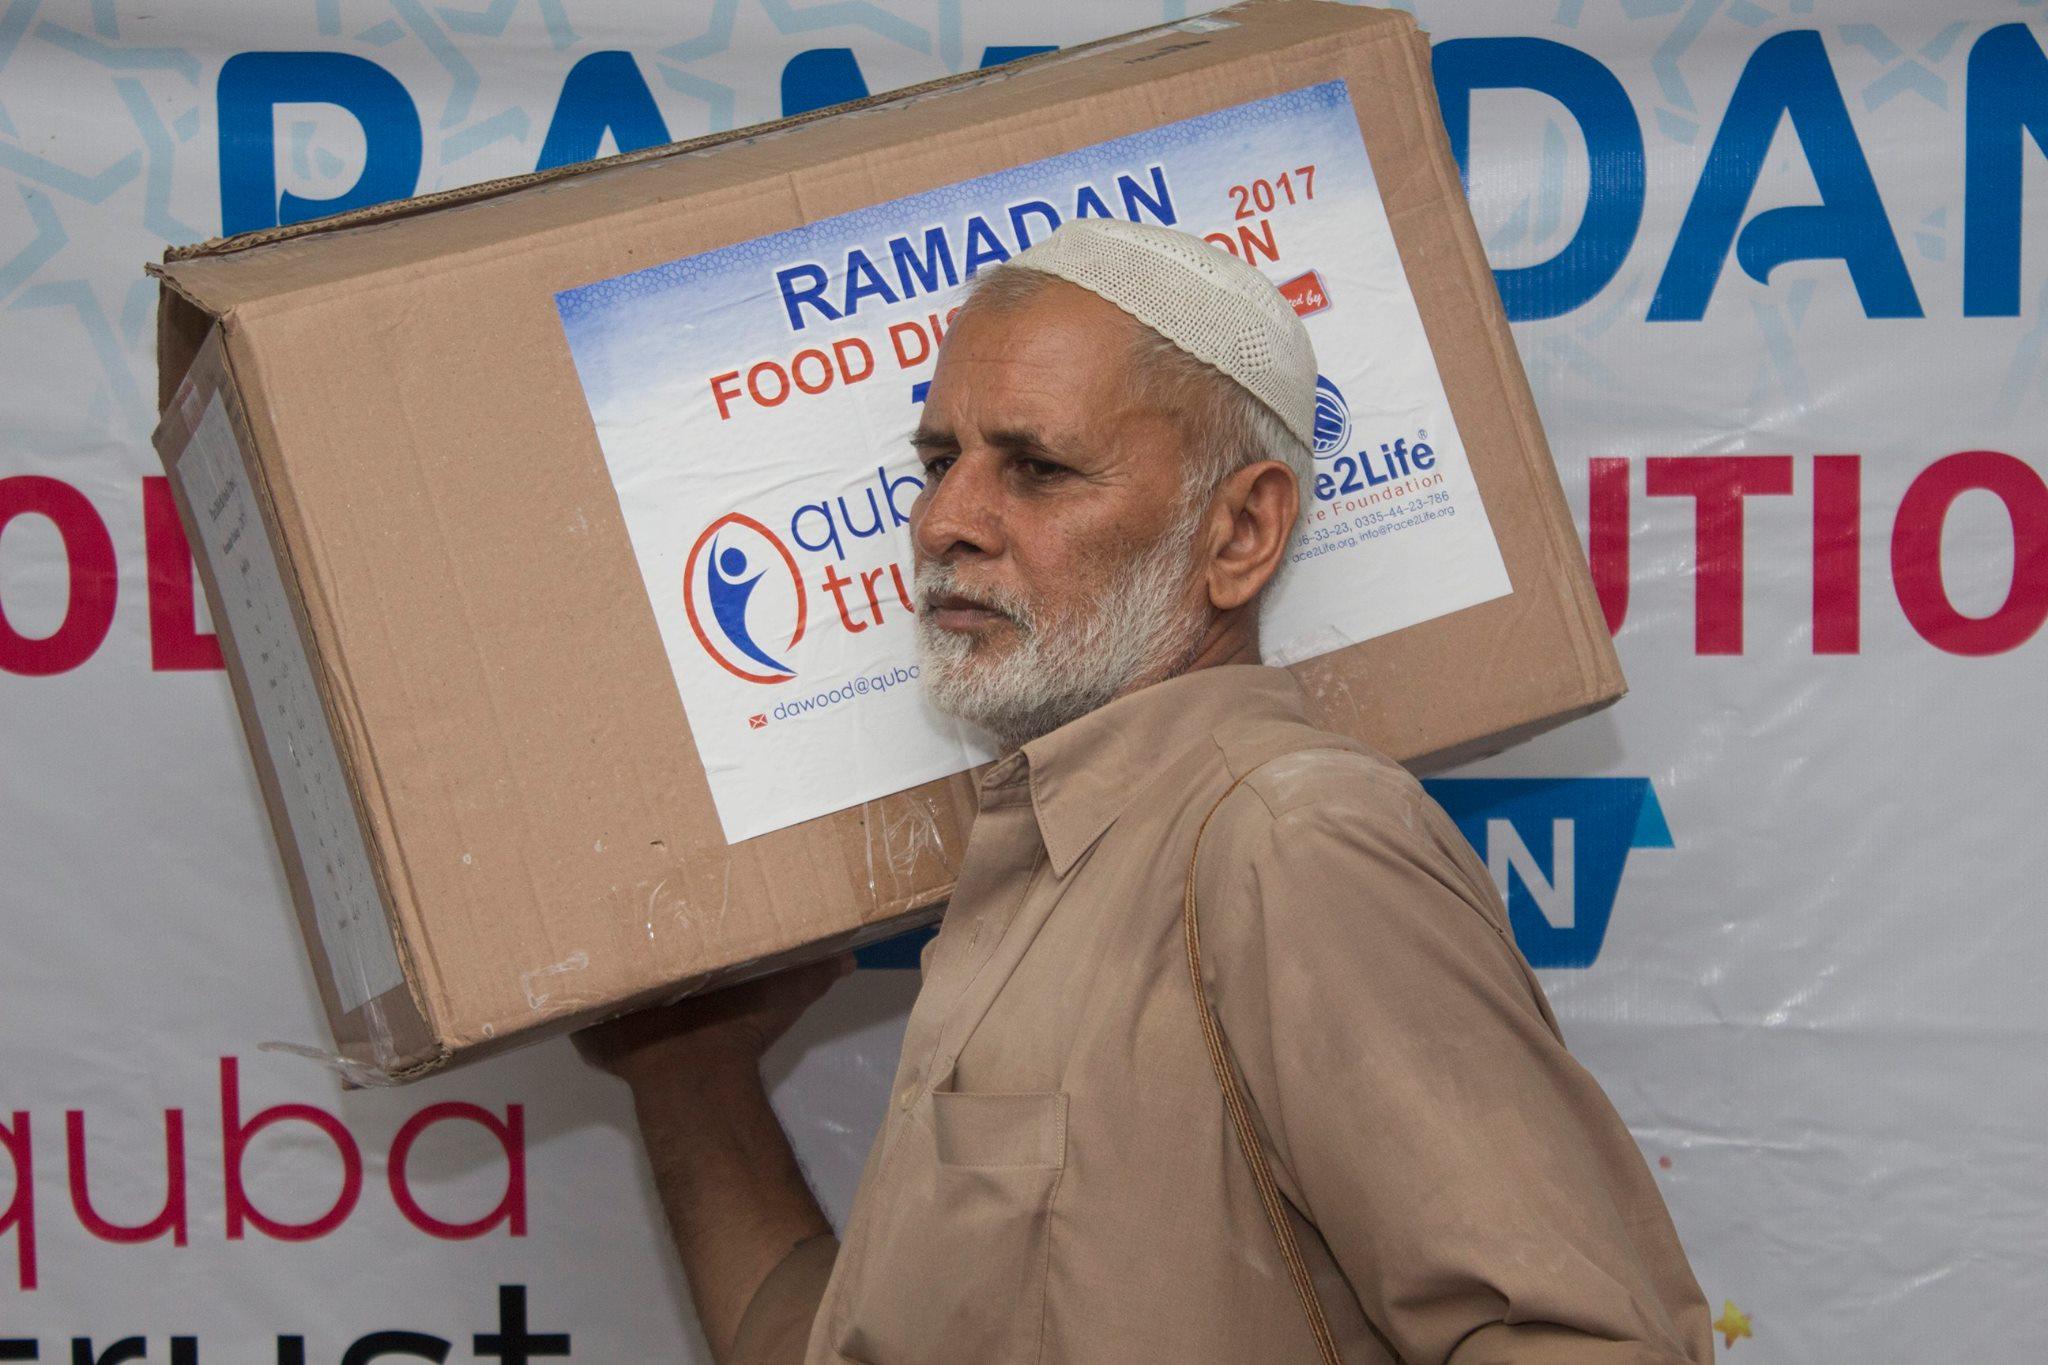 Ramadhan Food Packs by Quba Trust fundraising photo 2